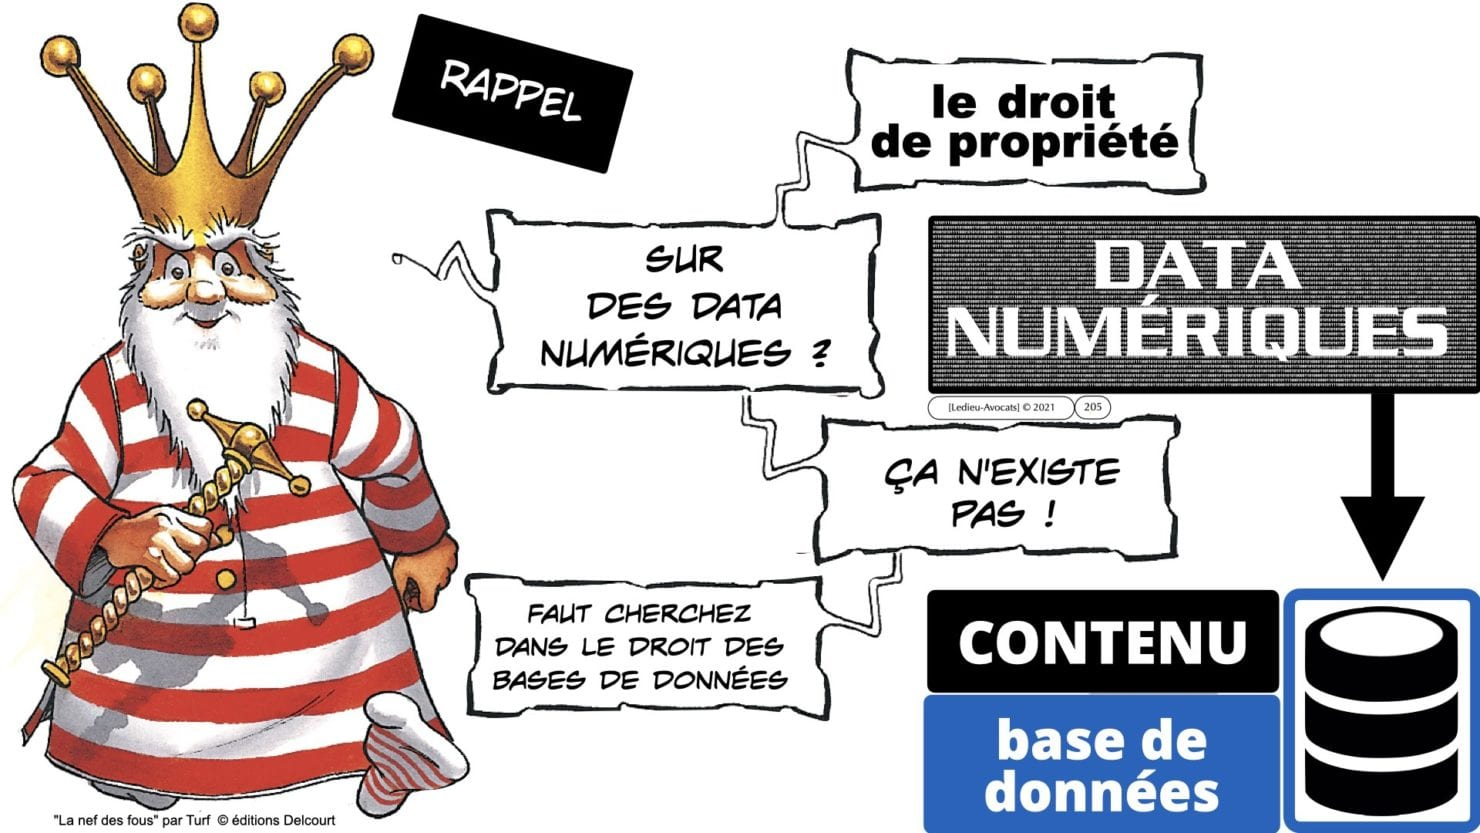 RGPD e-Privacy principes actualité jurisprudence ©Ledieu-Avocats 25-06-2021.205